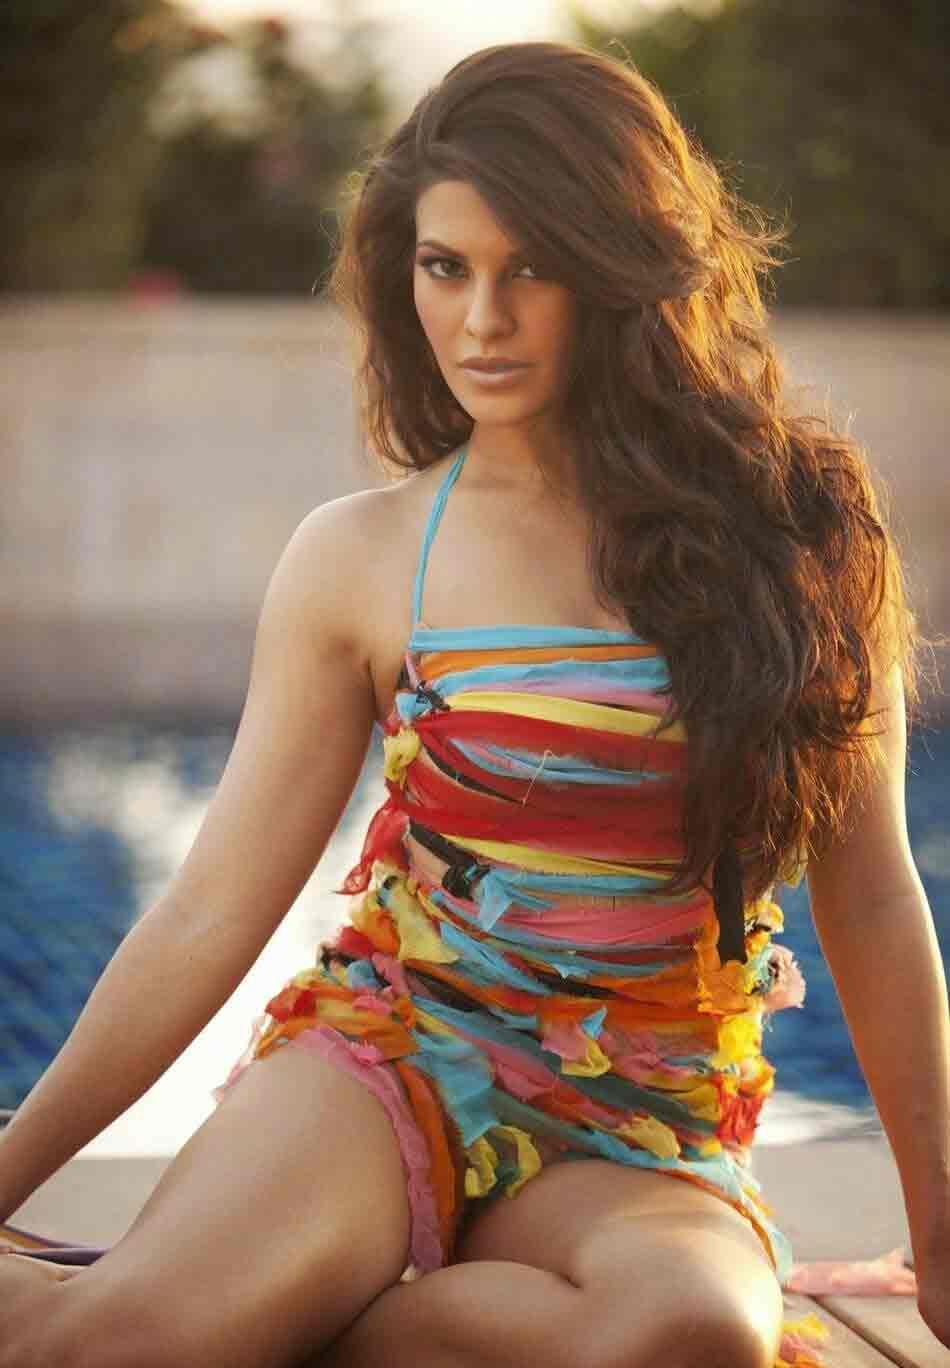 hot-model-actress-jacqueline-fernandez-bikini-images-in-sexy-colorful-bikini